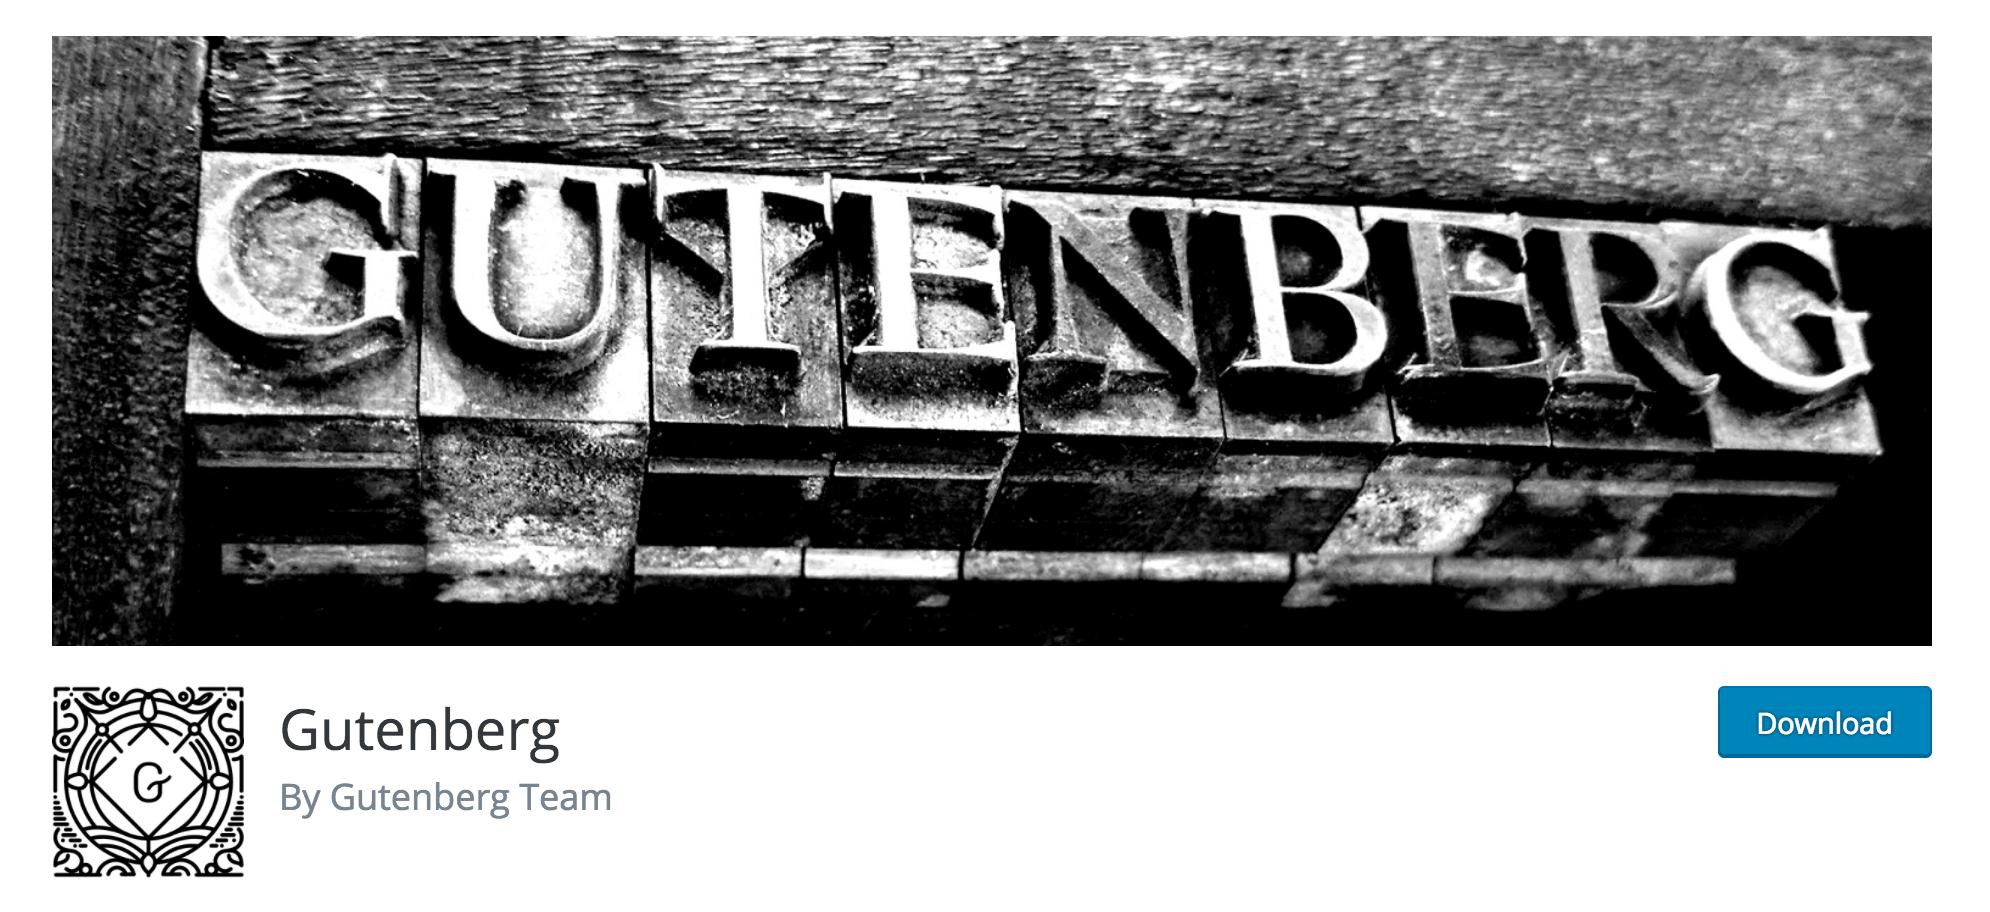 The Gutenberg plugin.